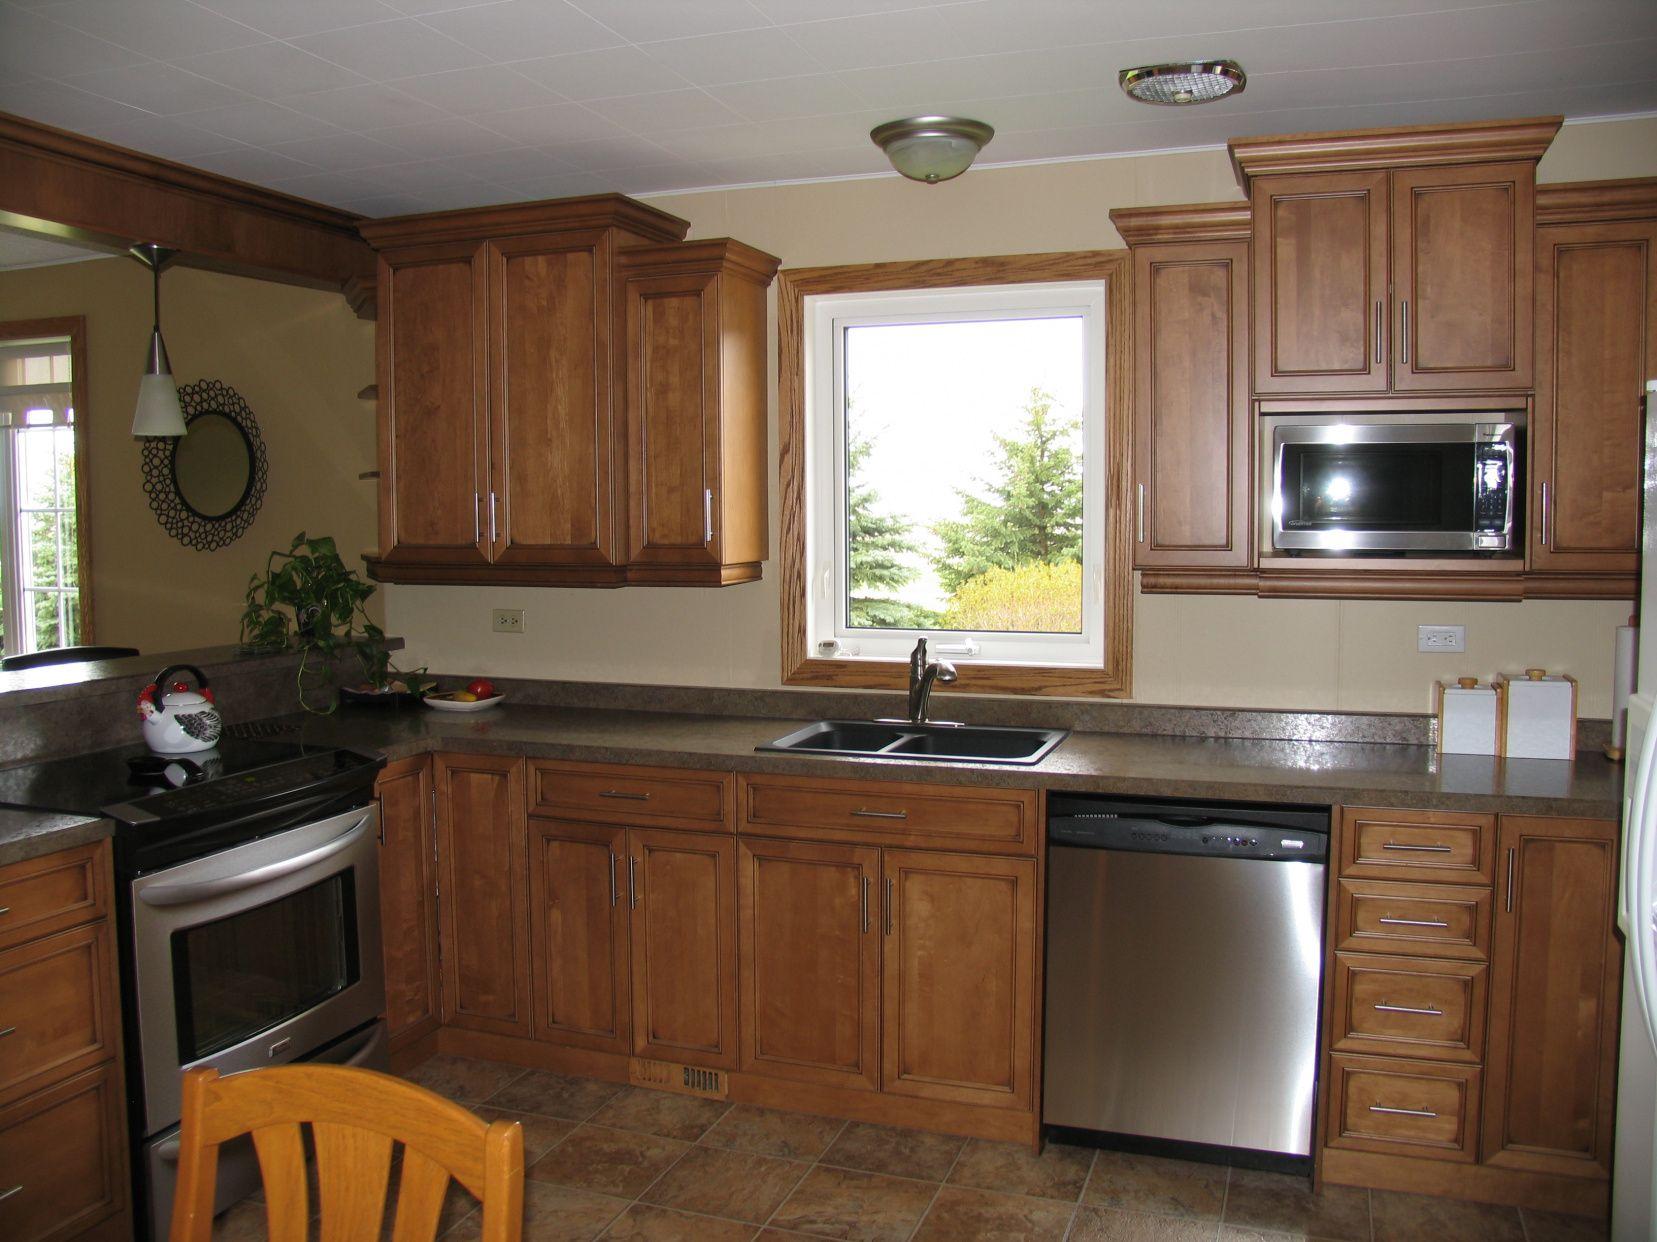 50 Wilsonart Quartz Countertops Kitchen Island Countertop Ideas Check More At Http